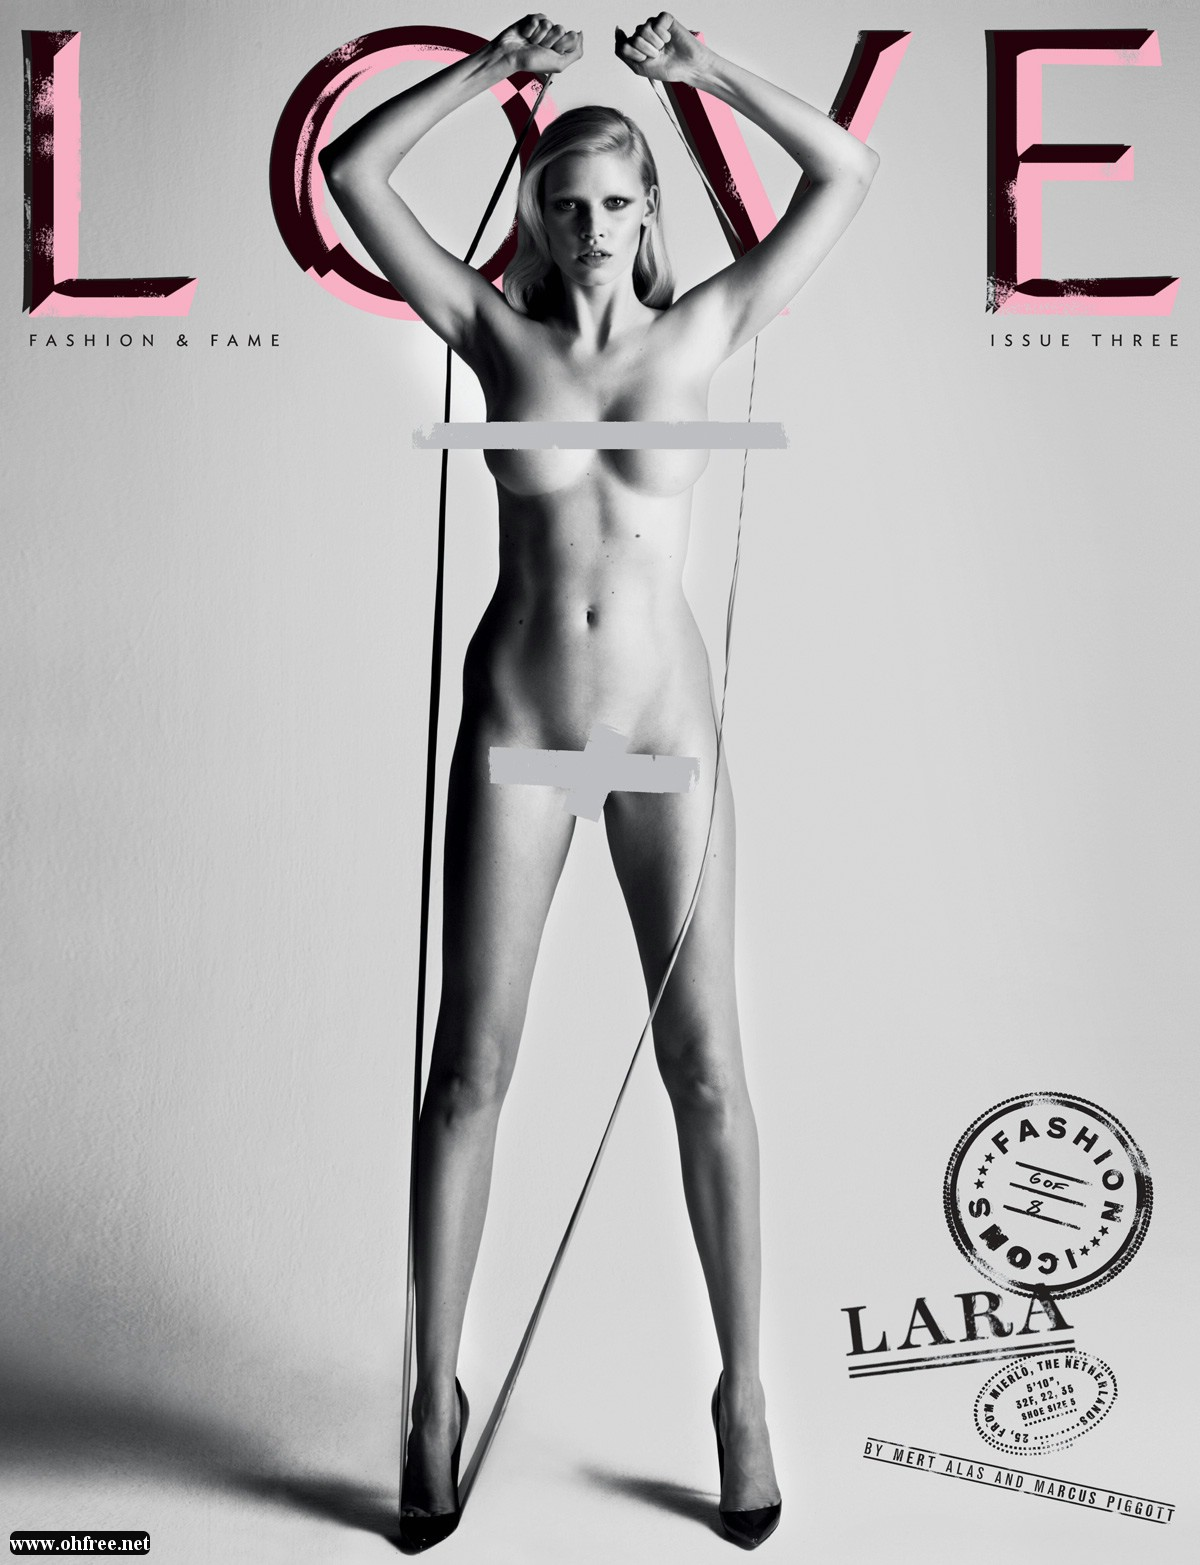 http://4.bp.blogspot.com/-orPyFhMeJ4E/TVRhDhiXLuI/AAAAAAAAEnQ/_djuu5nGXQk/s1600/love-lara-stone-nude-00.jpg